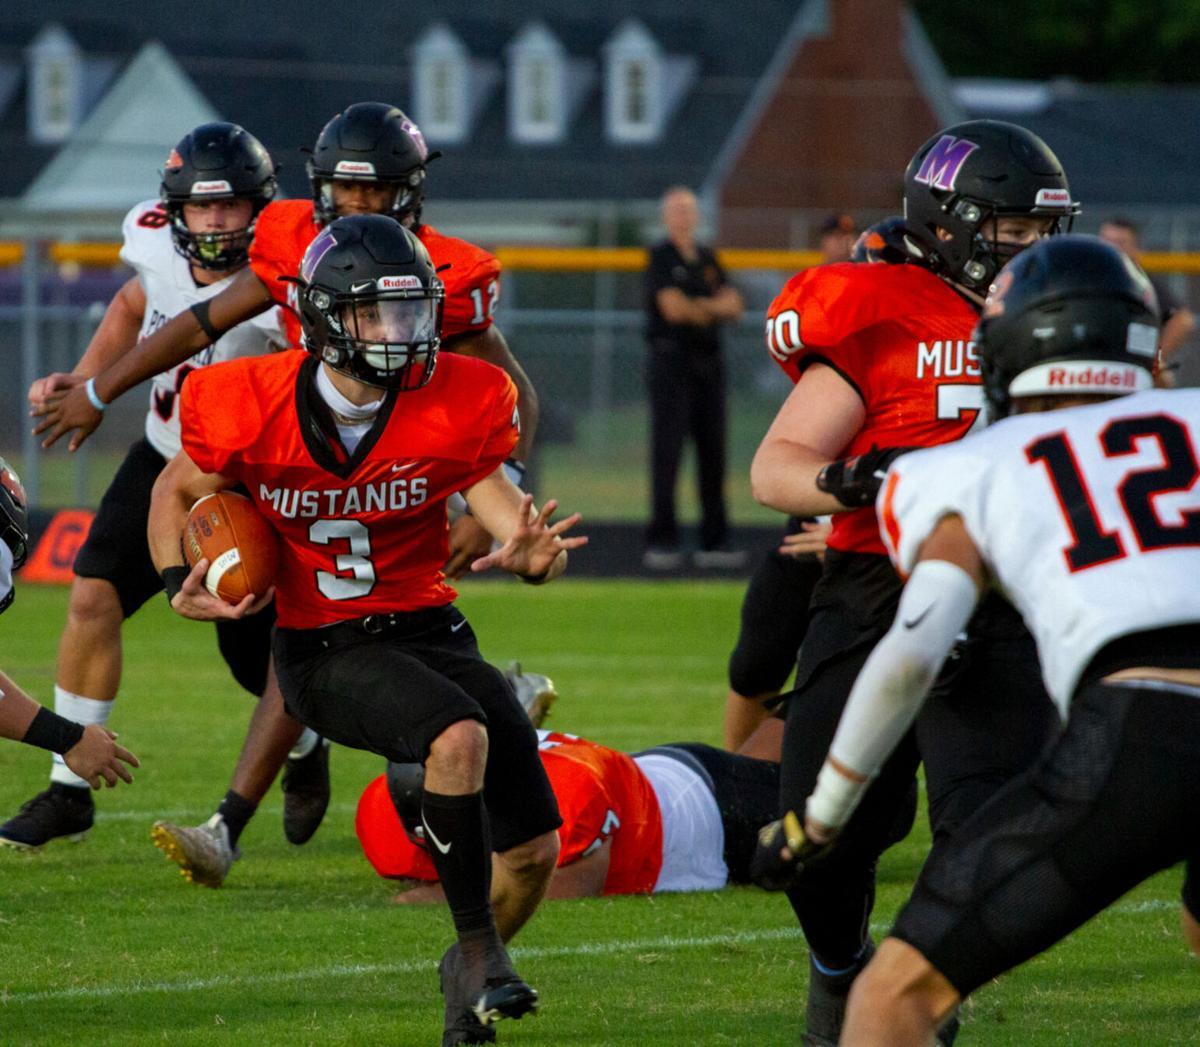 Powhatan at Mechanicsville football: Varner eyes opponent